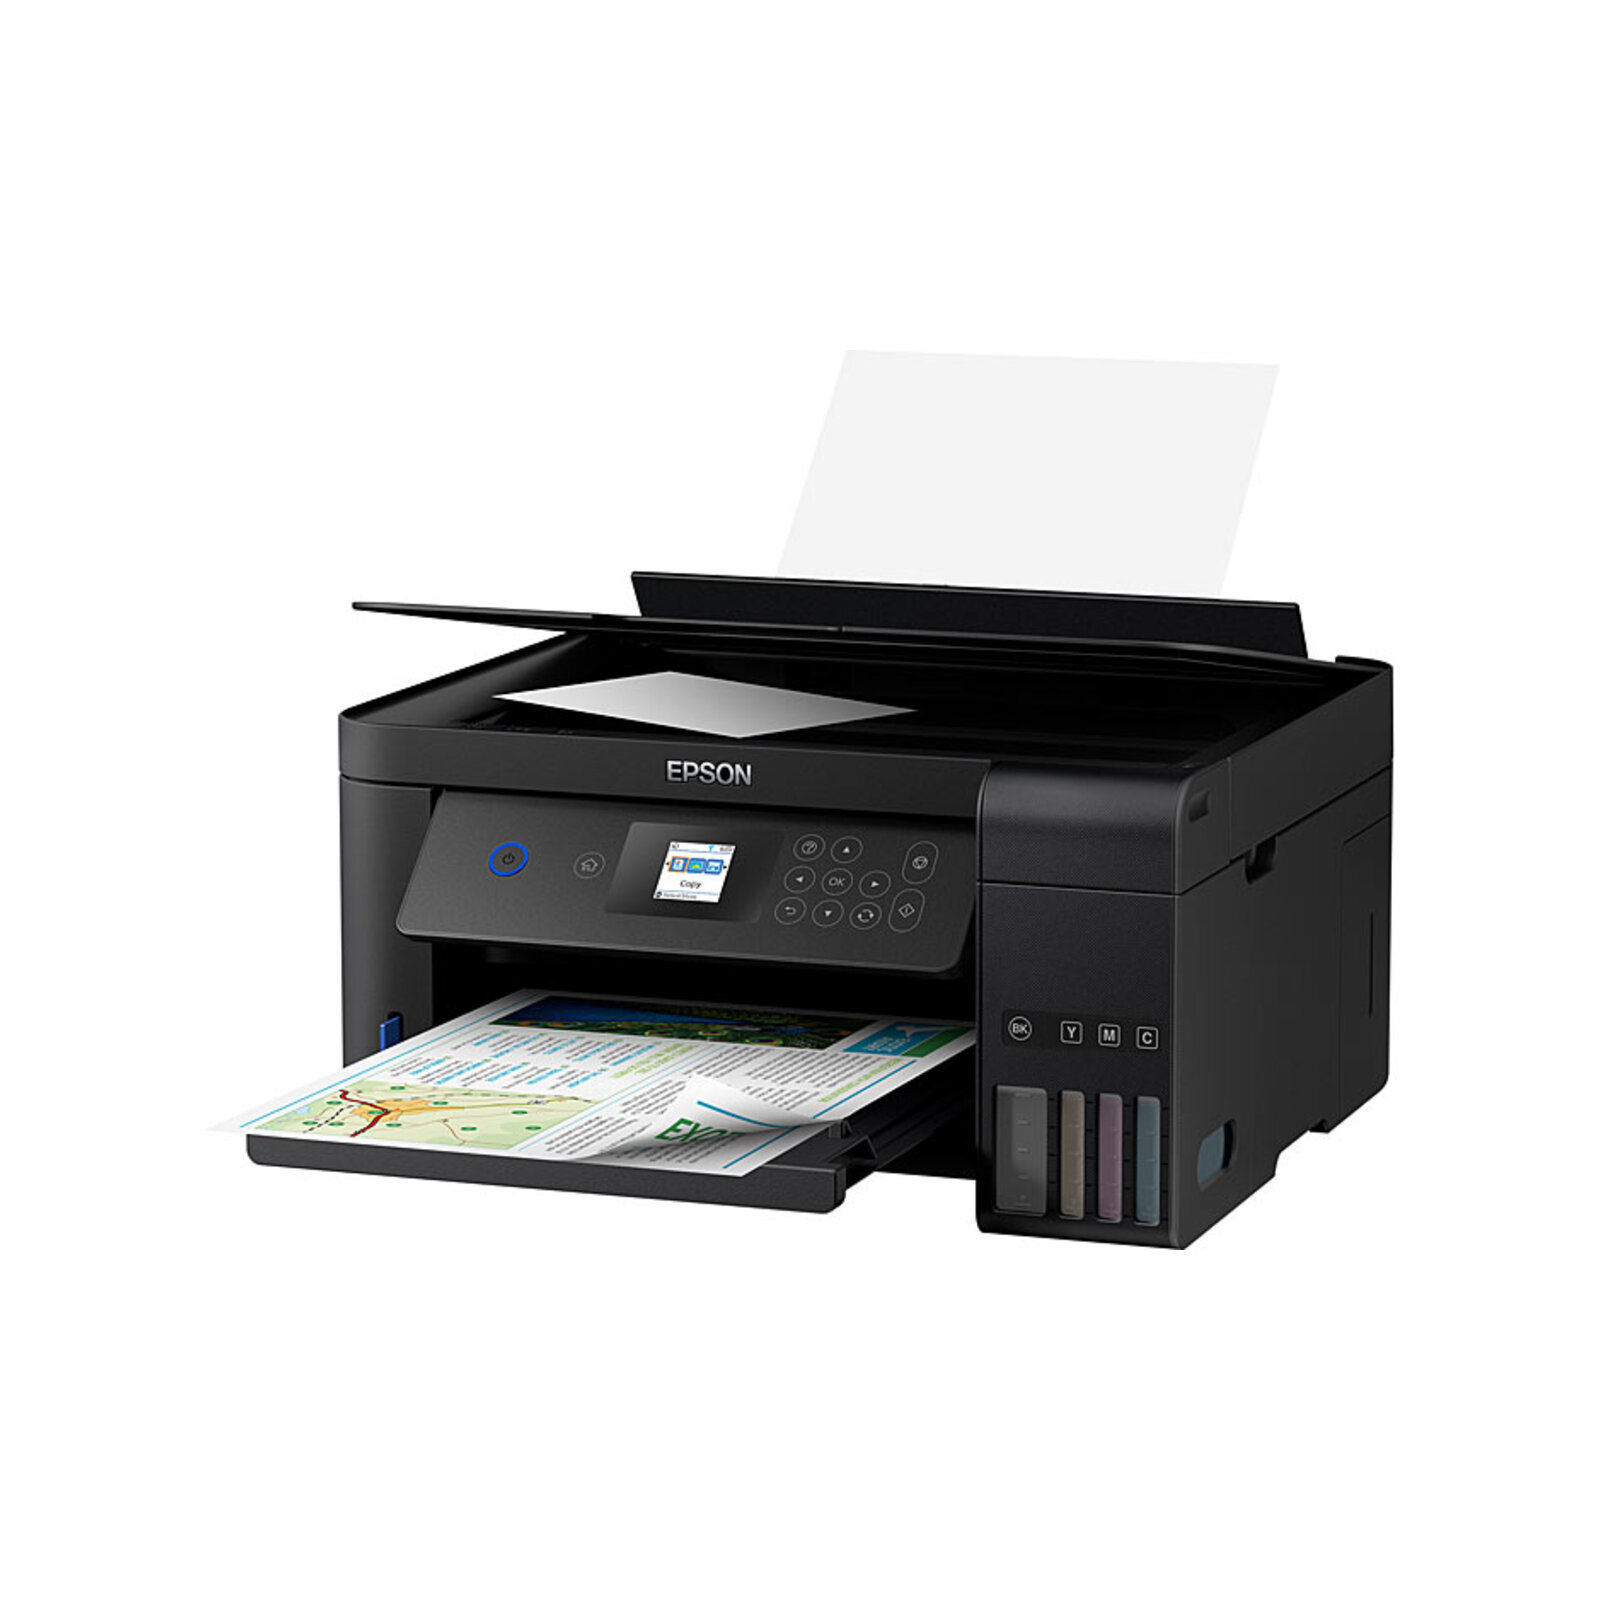 Epson EcoTank ET-2750 Inkjet MFP - Print, Copy, Scan, Wi-Fi Direct